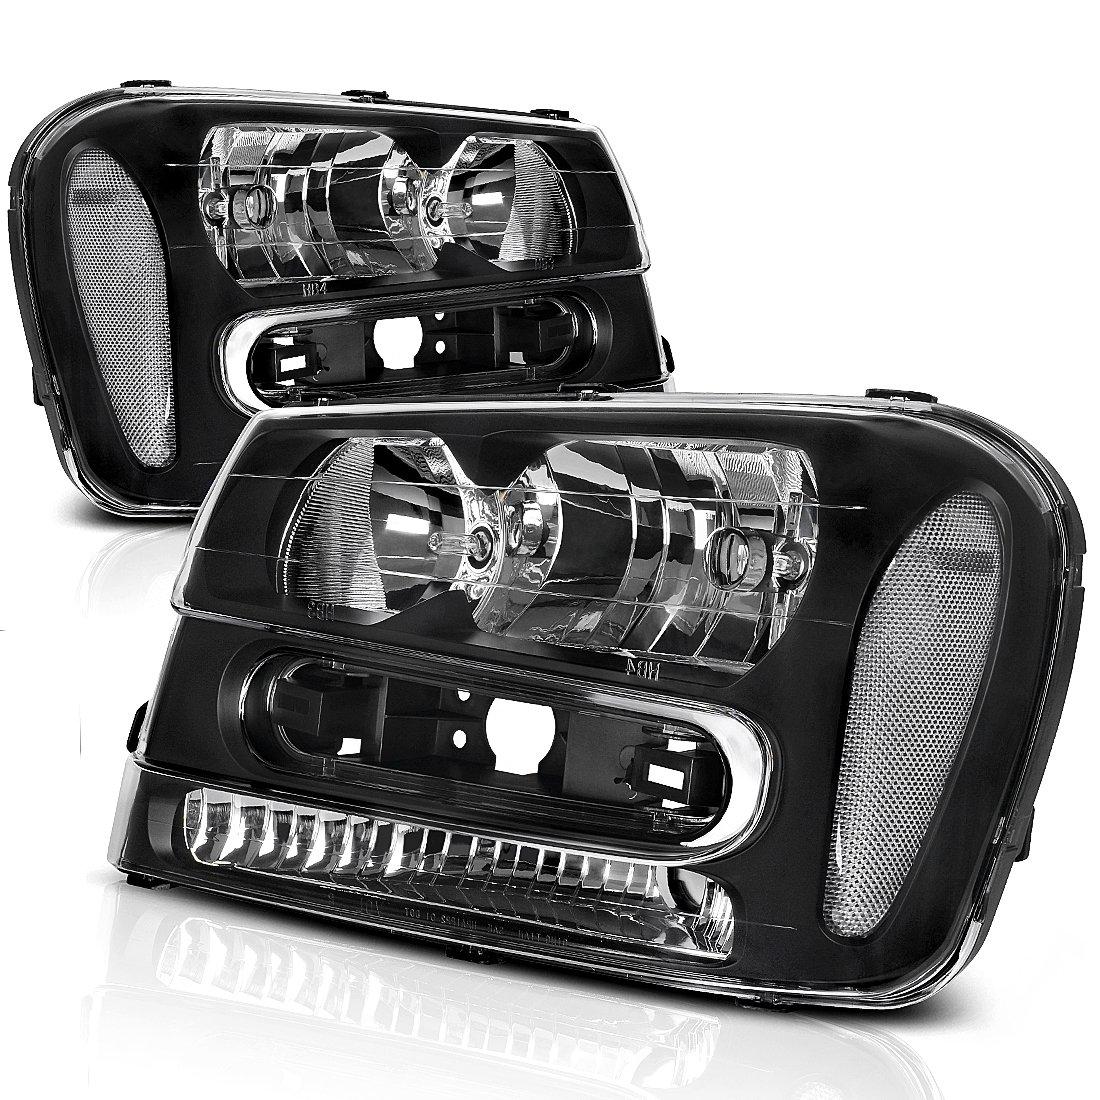 Headlight Assembly for 2002 2003 2004 2005 2006 2007 2008 2009 Chevy Chevrolet Trailblazer Replacement Black Housing Headlamp,One-Year Warranty (W/Full Width Grille, Pair) AUTOSAVER88 Chevy Trailblazer 2002-2009